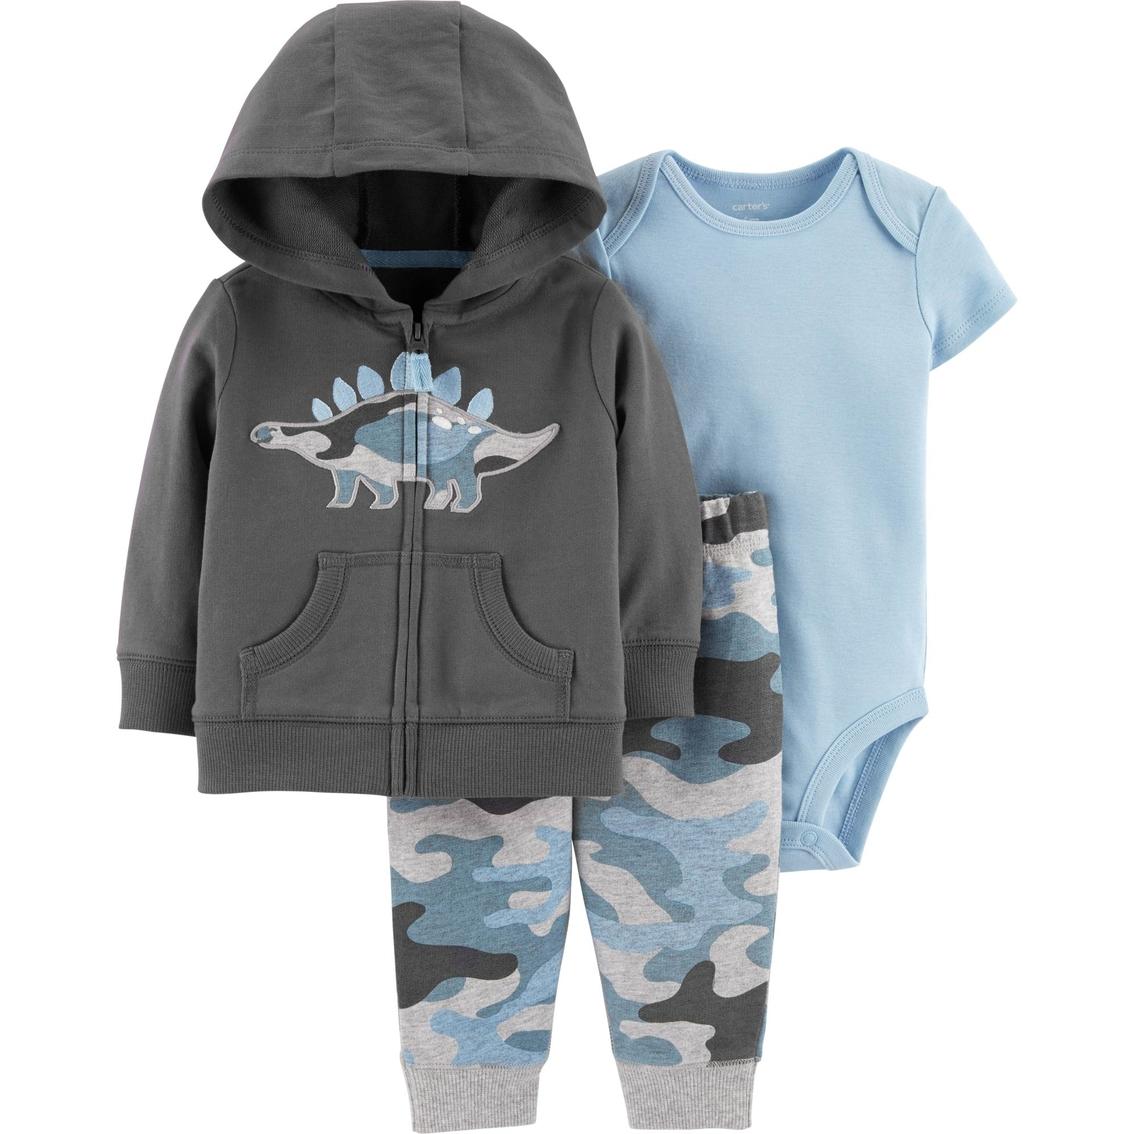 5ac95df94 Carter's Infant Boys Dinosaur Jacket, Bodysuit And Pants 3 Pc. Set ...